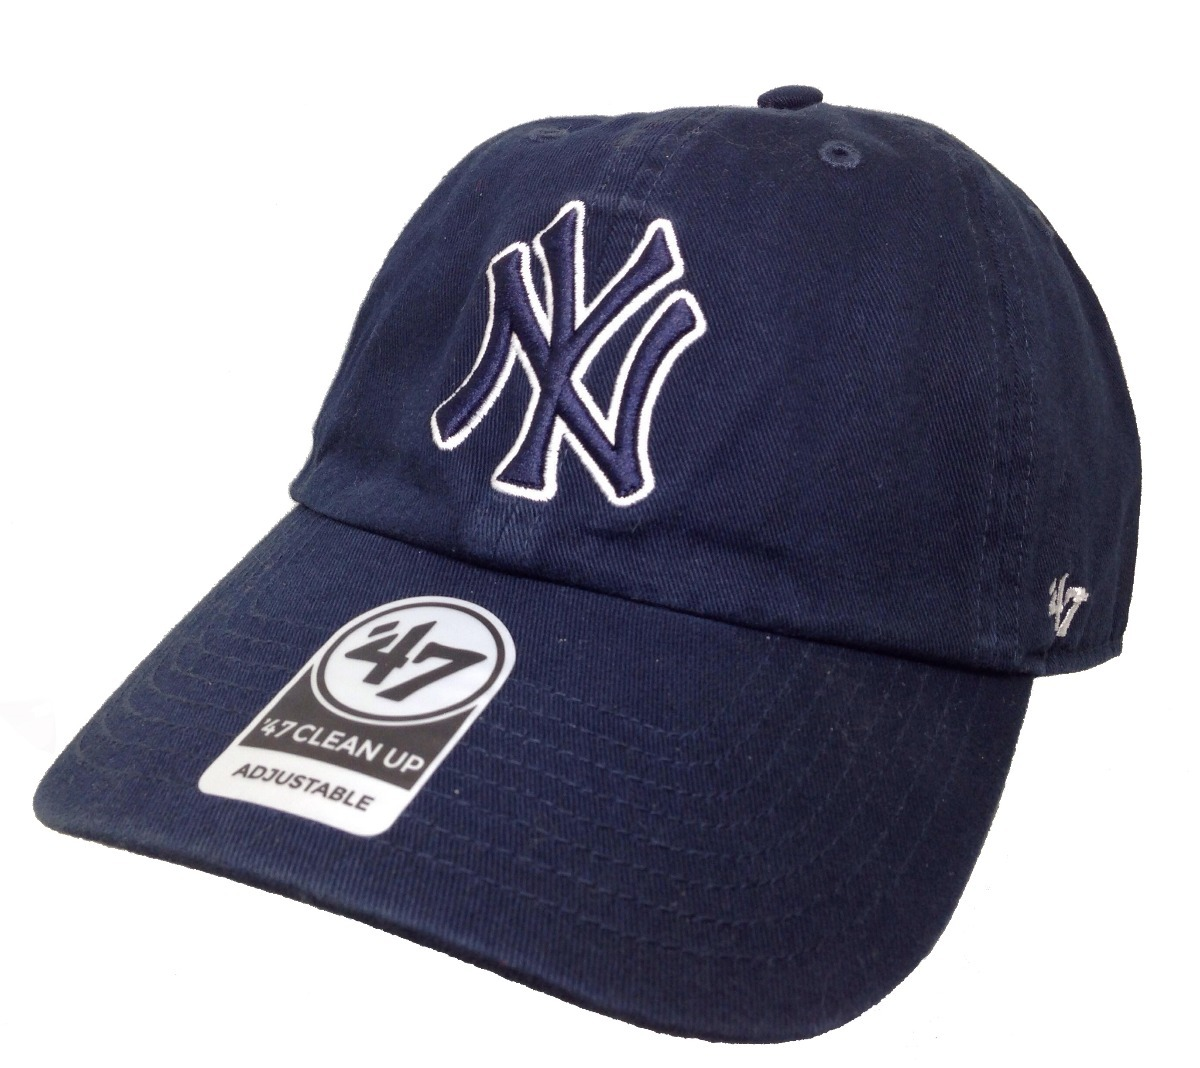 9b54d7eaa4a59 new york yankees  47 brand clean up azul dad hat ajustab mlb. Cargando zoom.